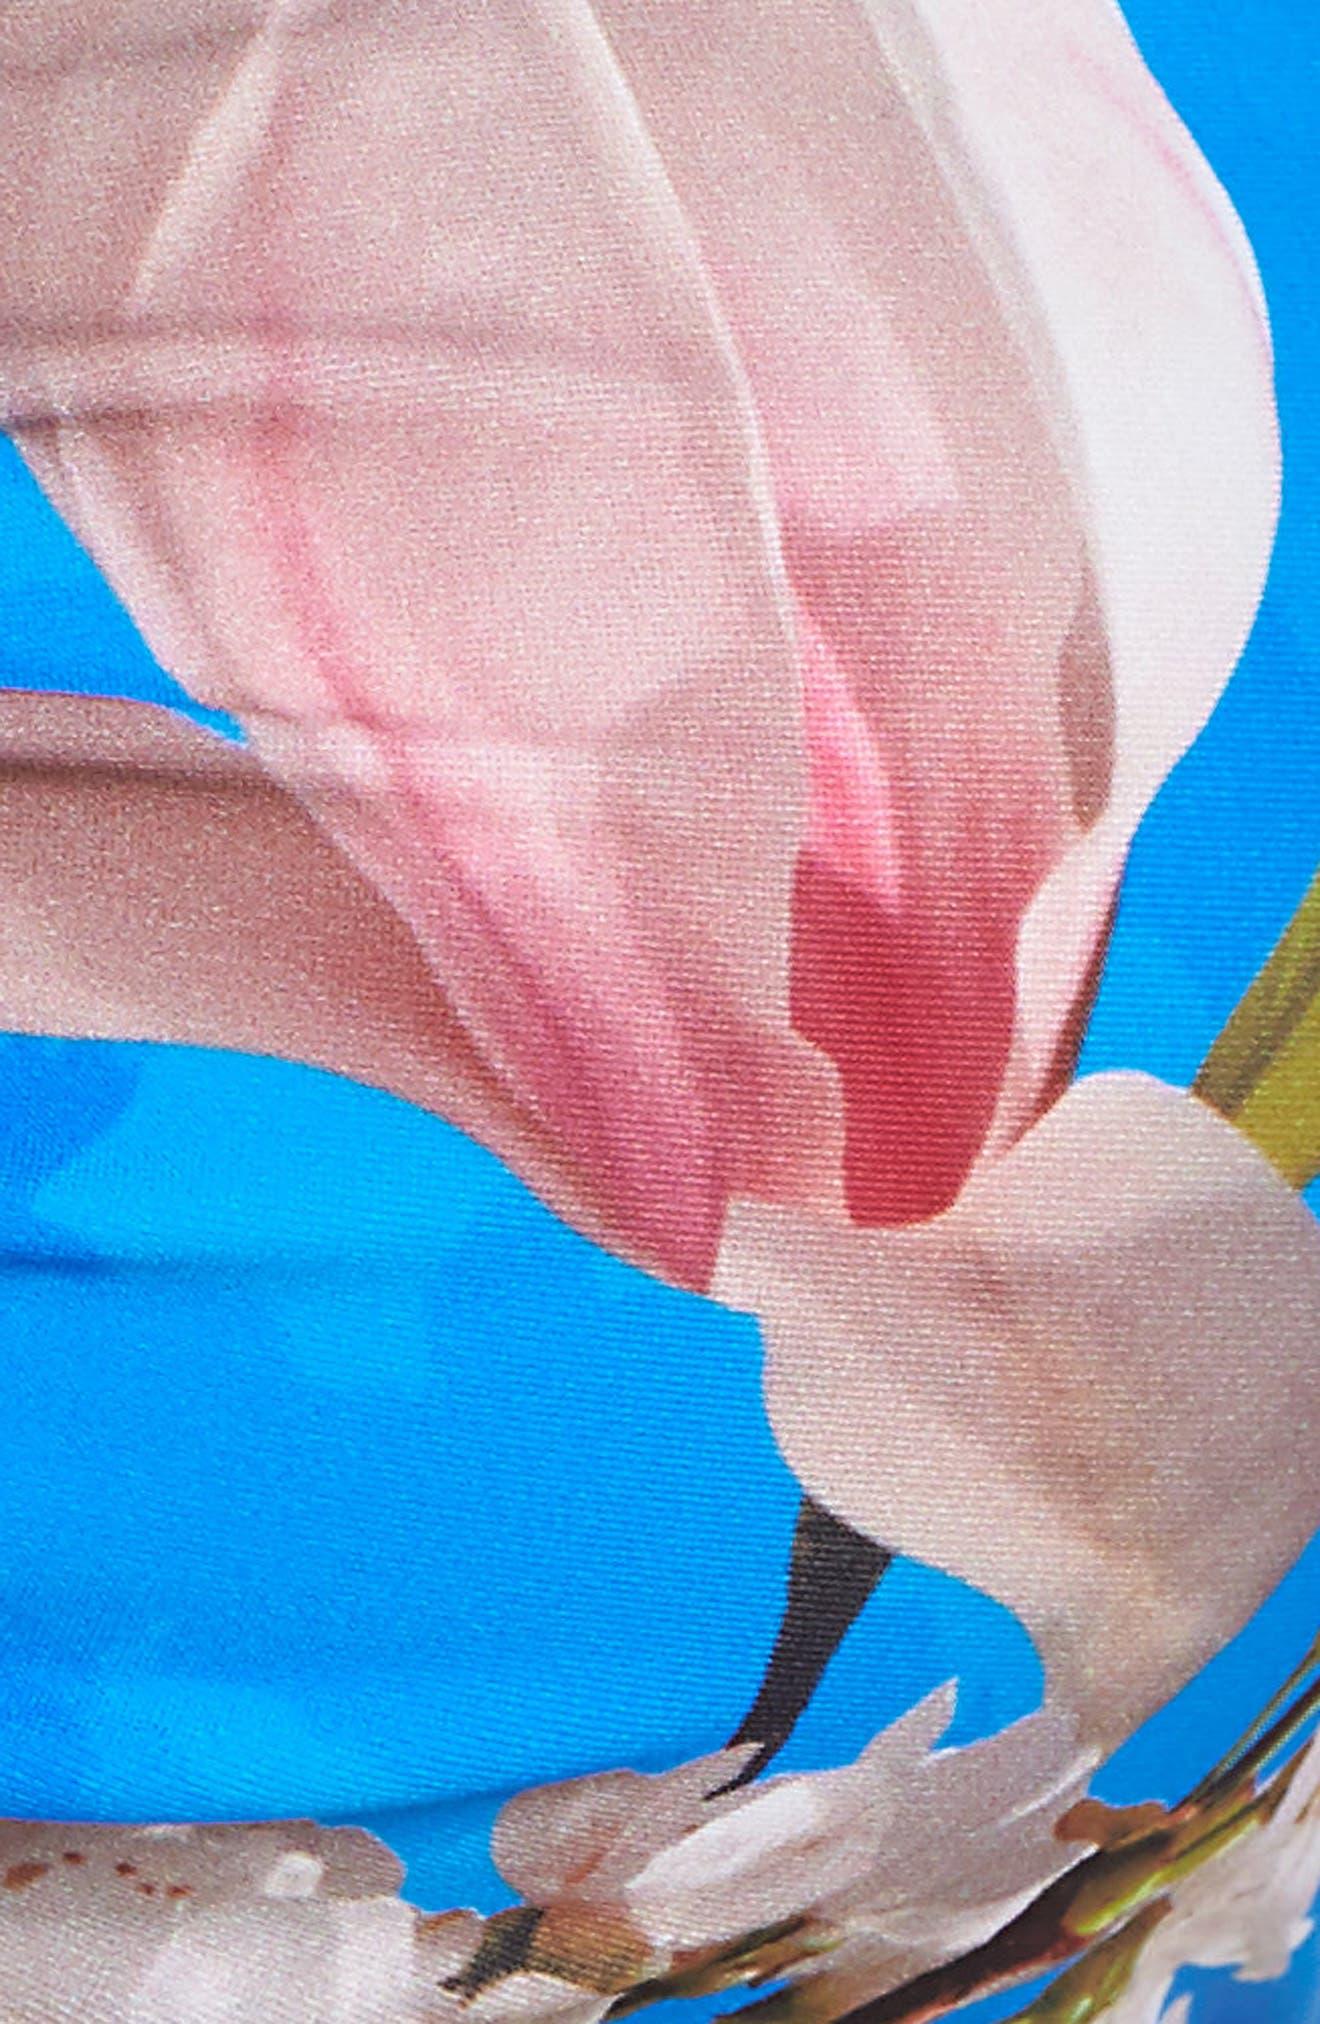 Harmony Strapless Bikini Top,                             Alternate thumbnail 9, color,                             Bright Blue